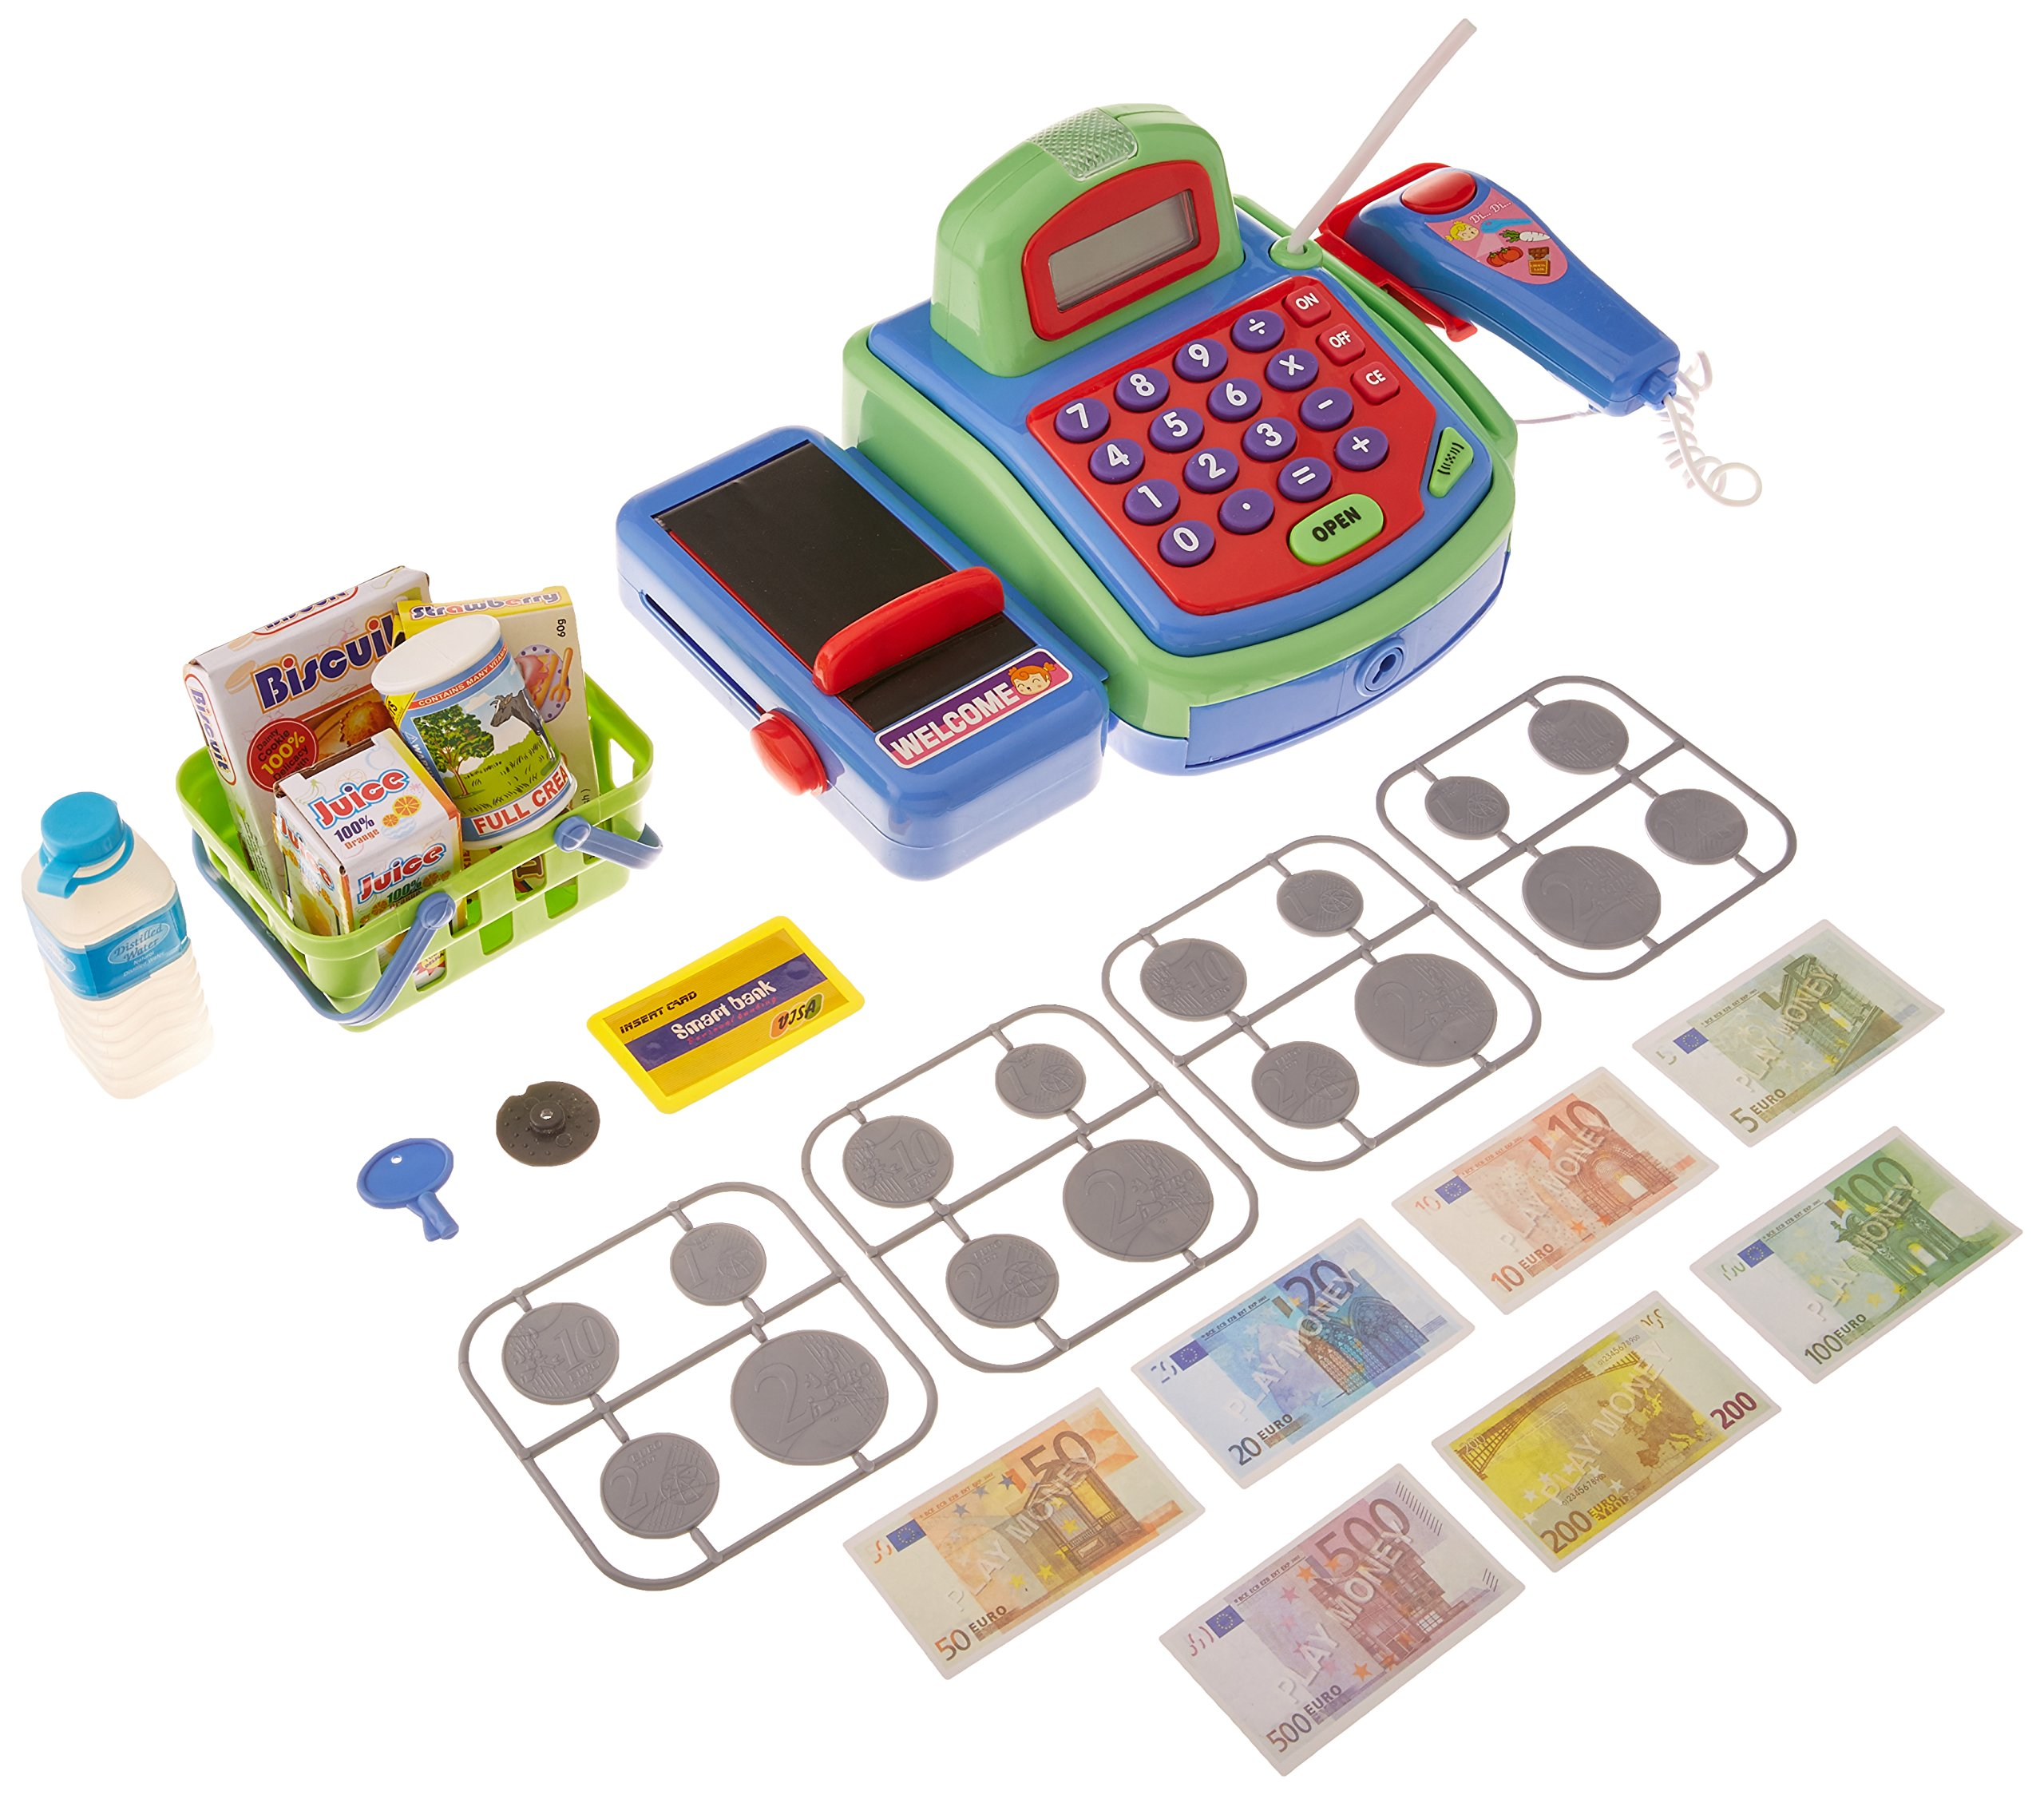 buy velocity toys toy cash register imagine multi functional